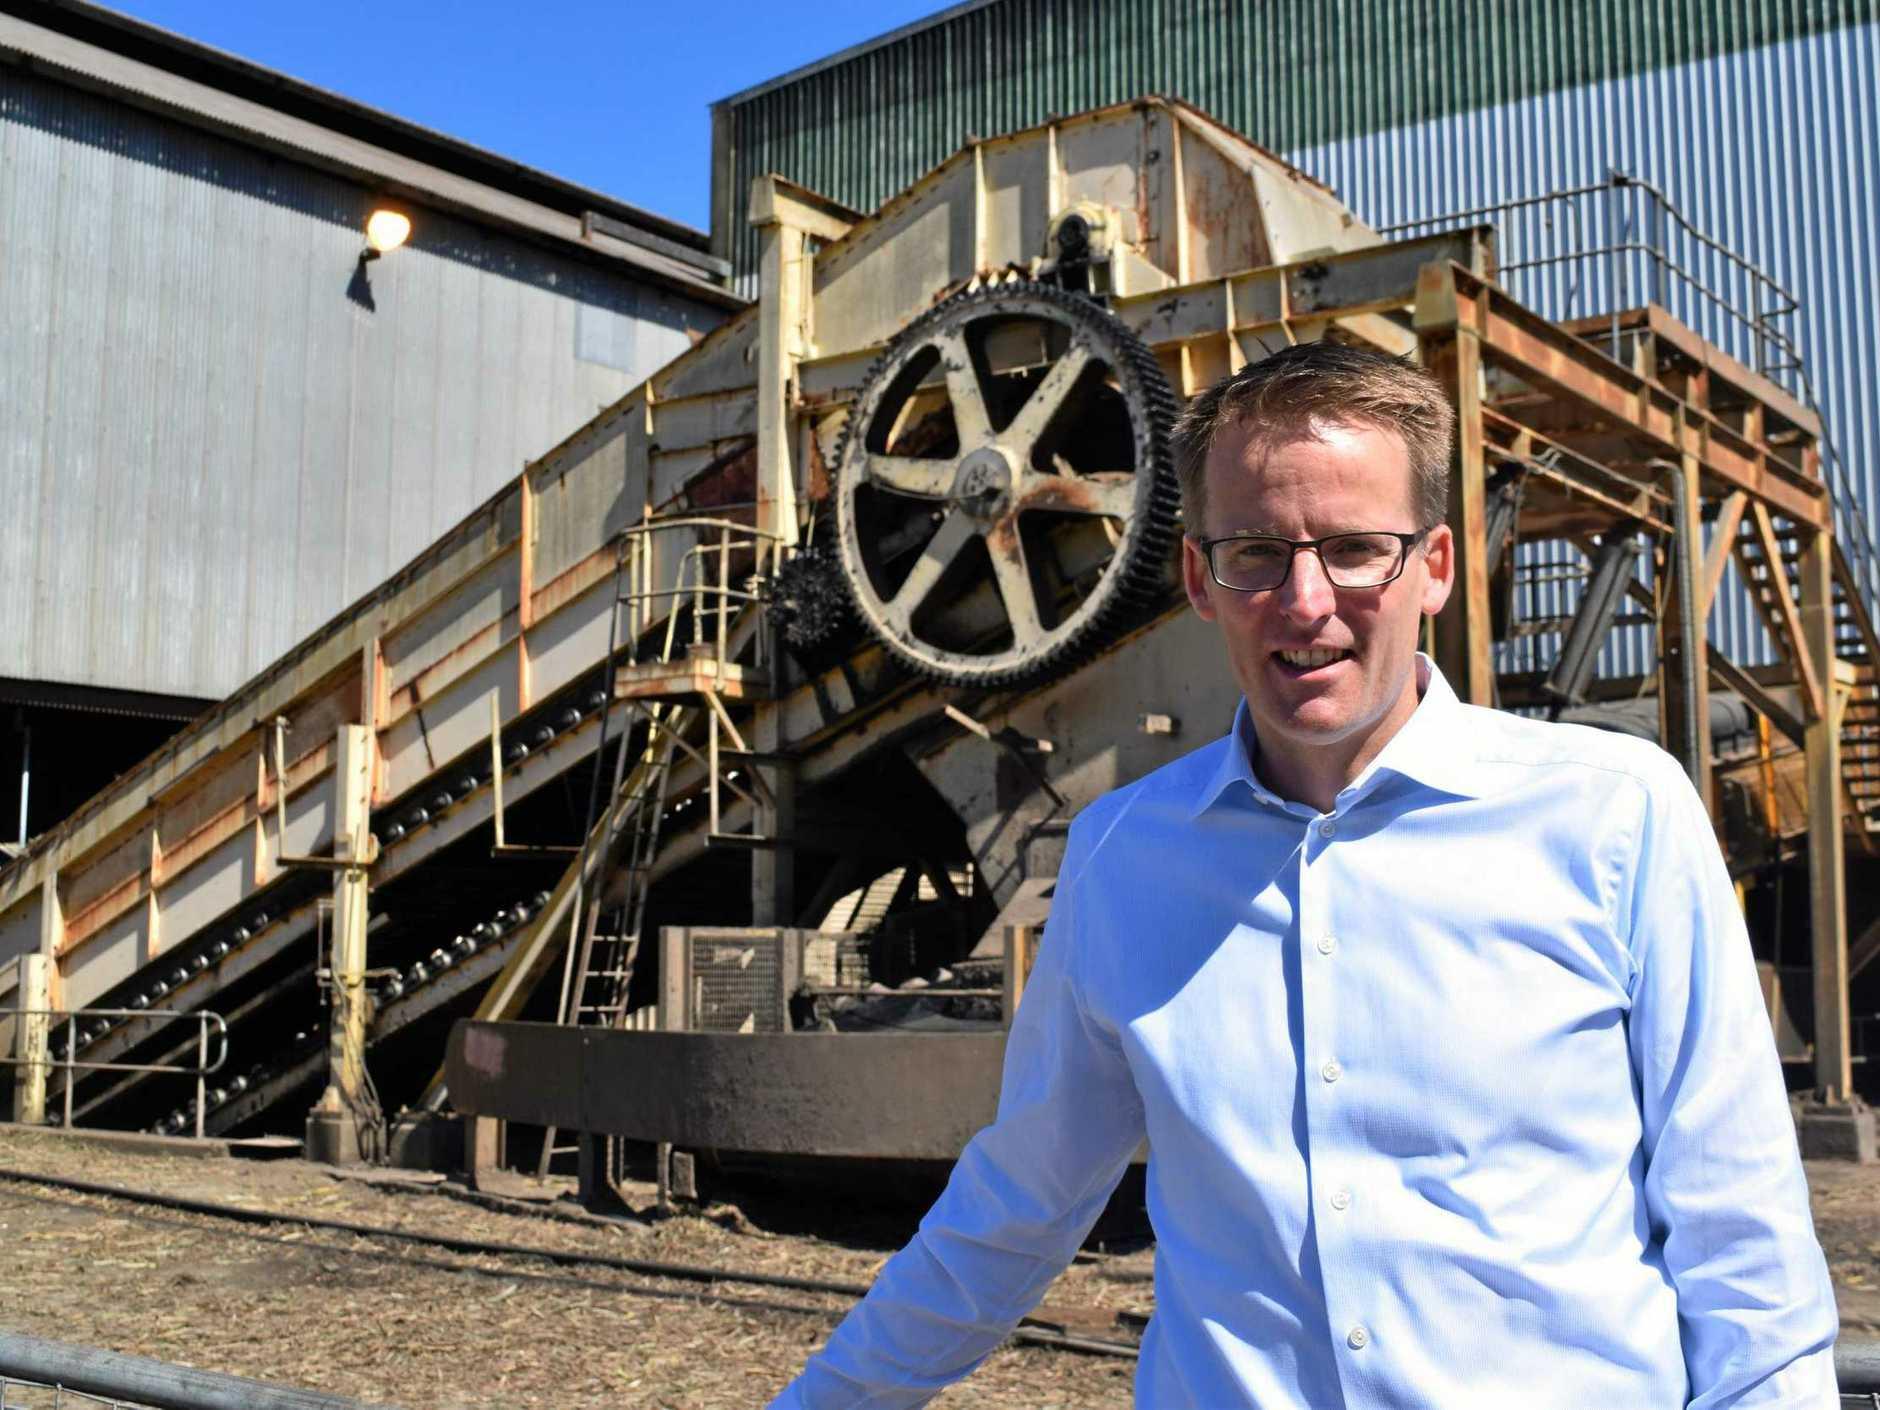 Nordzucker CEO Lars Gorissen toured Farleigh Mill today during a visit to Mackay.